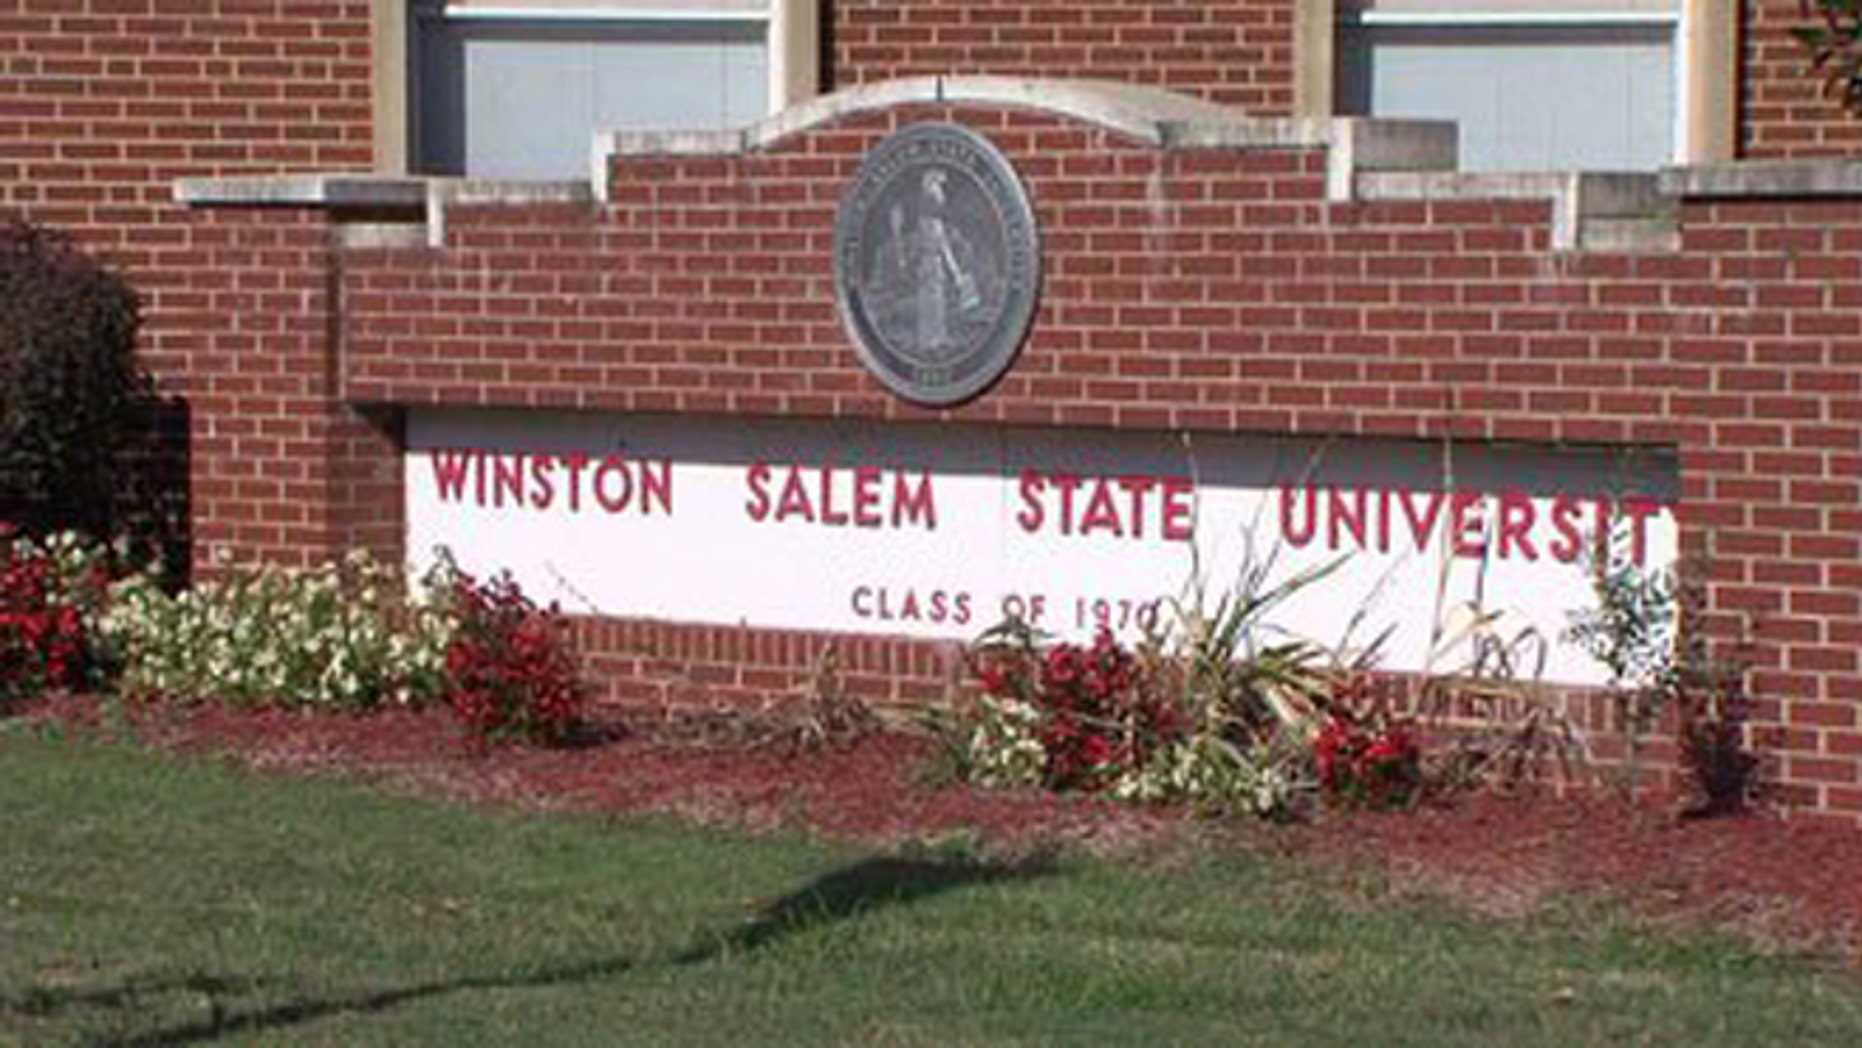 At least 1 dead, 1 injured at Winston-Salem State University.